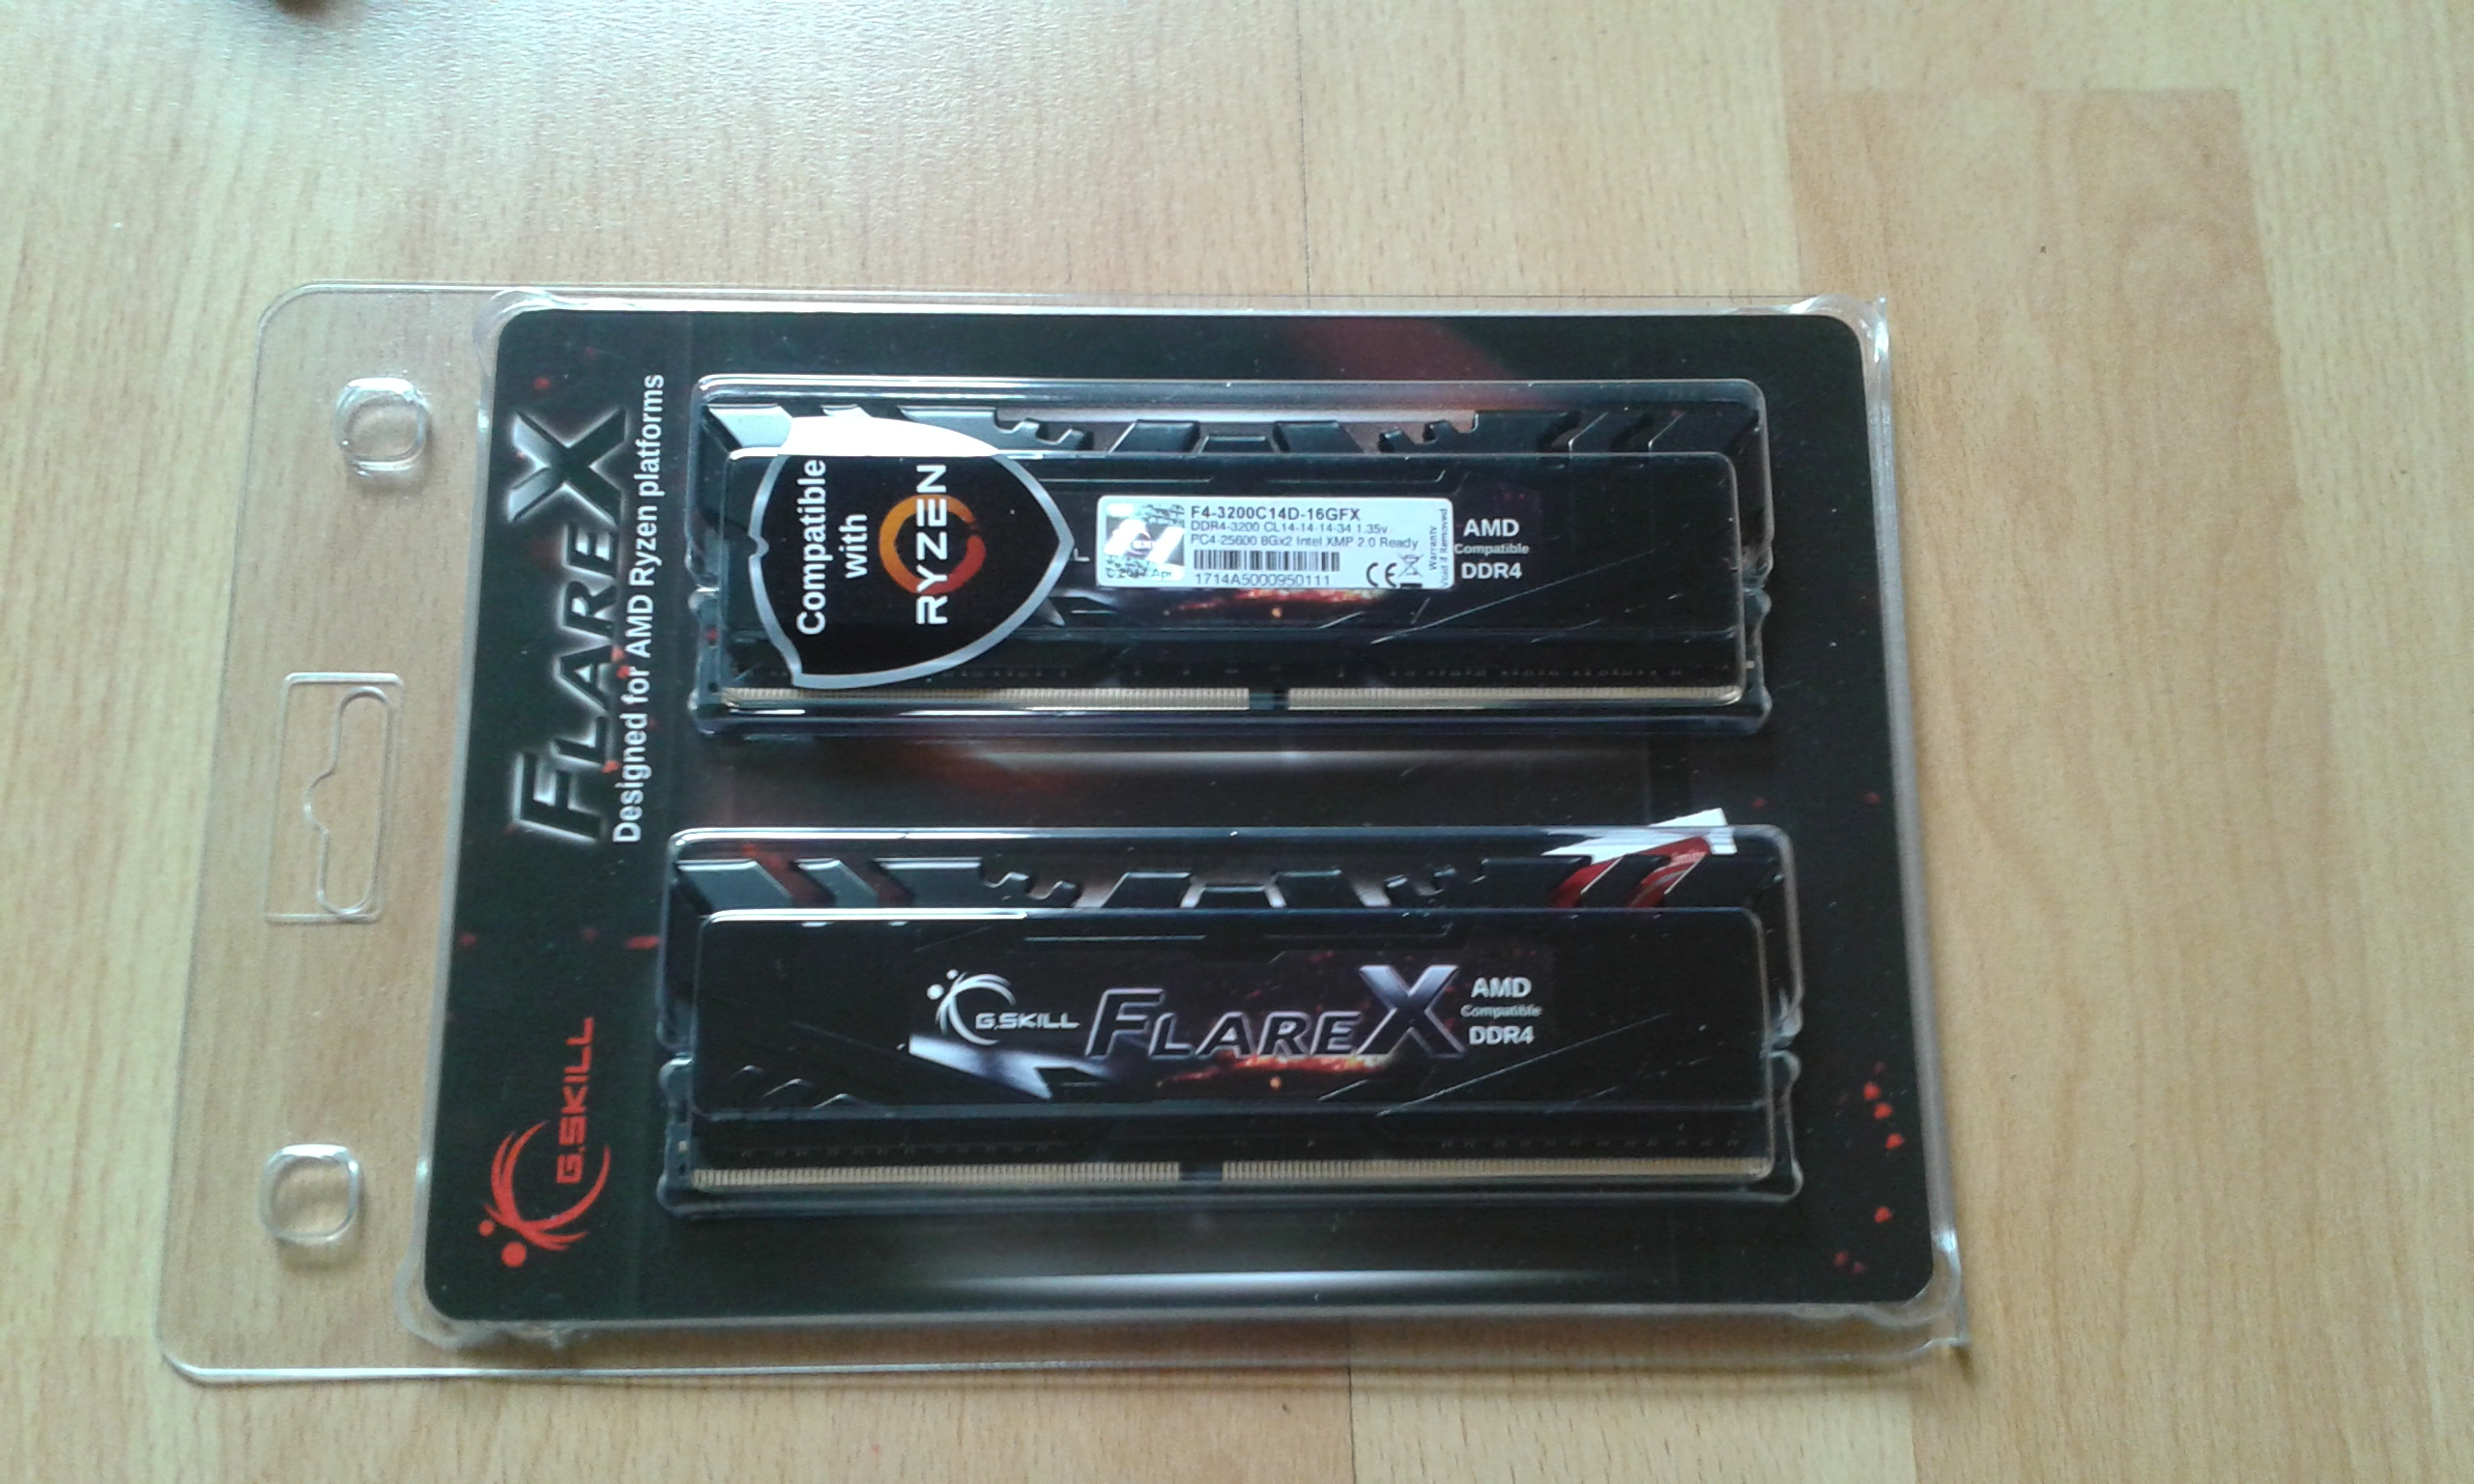 G Skill FlareX DDR4-3200 C14-14-14-34 1,35v Review - User reviews